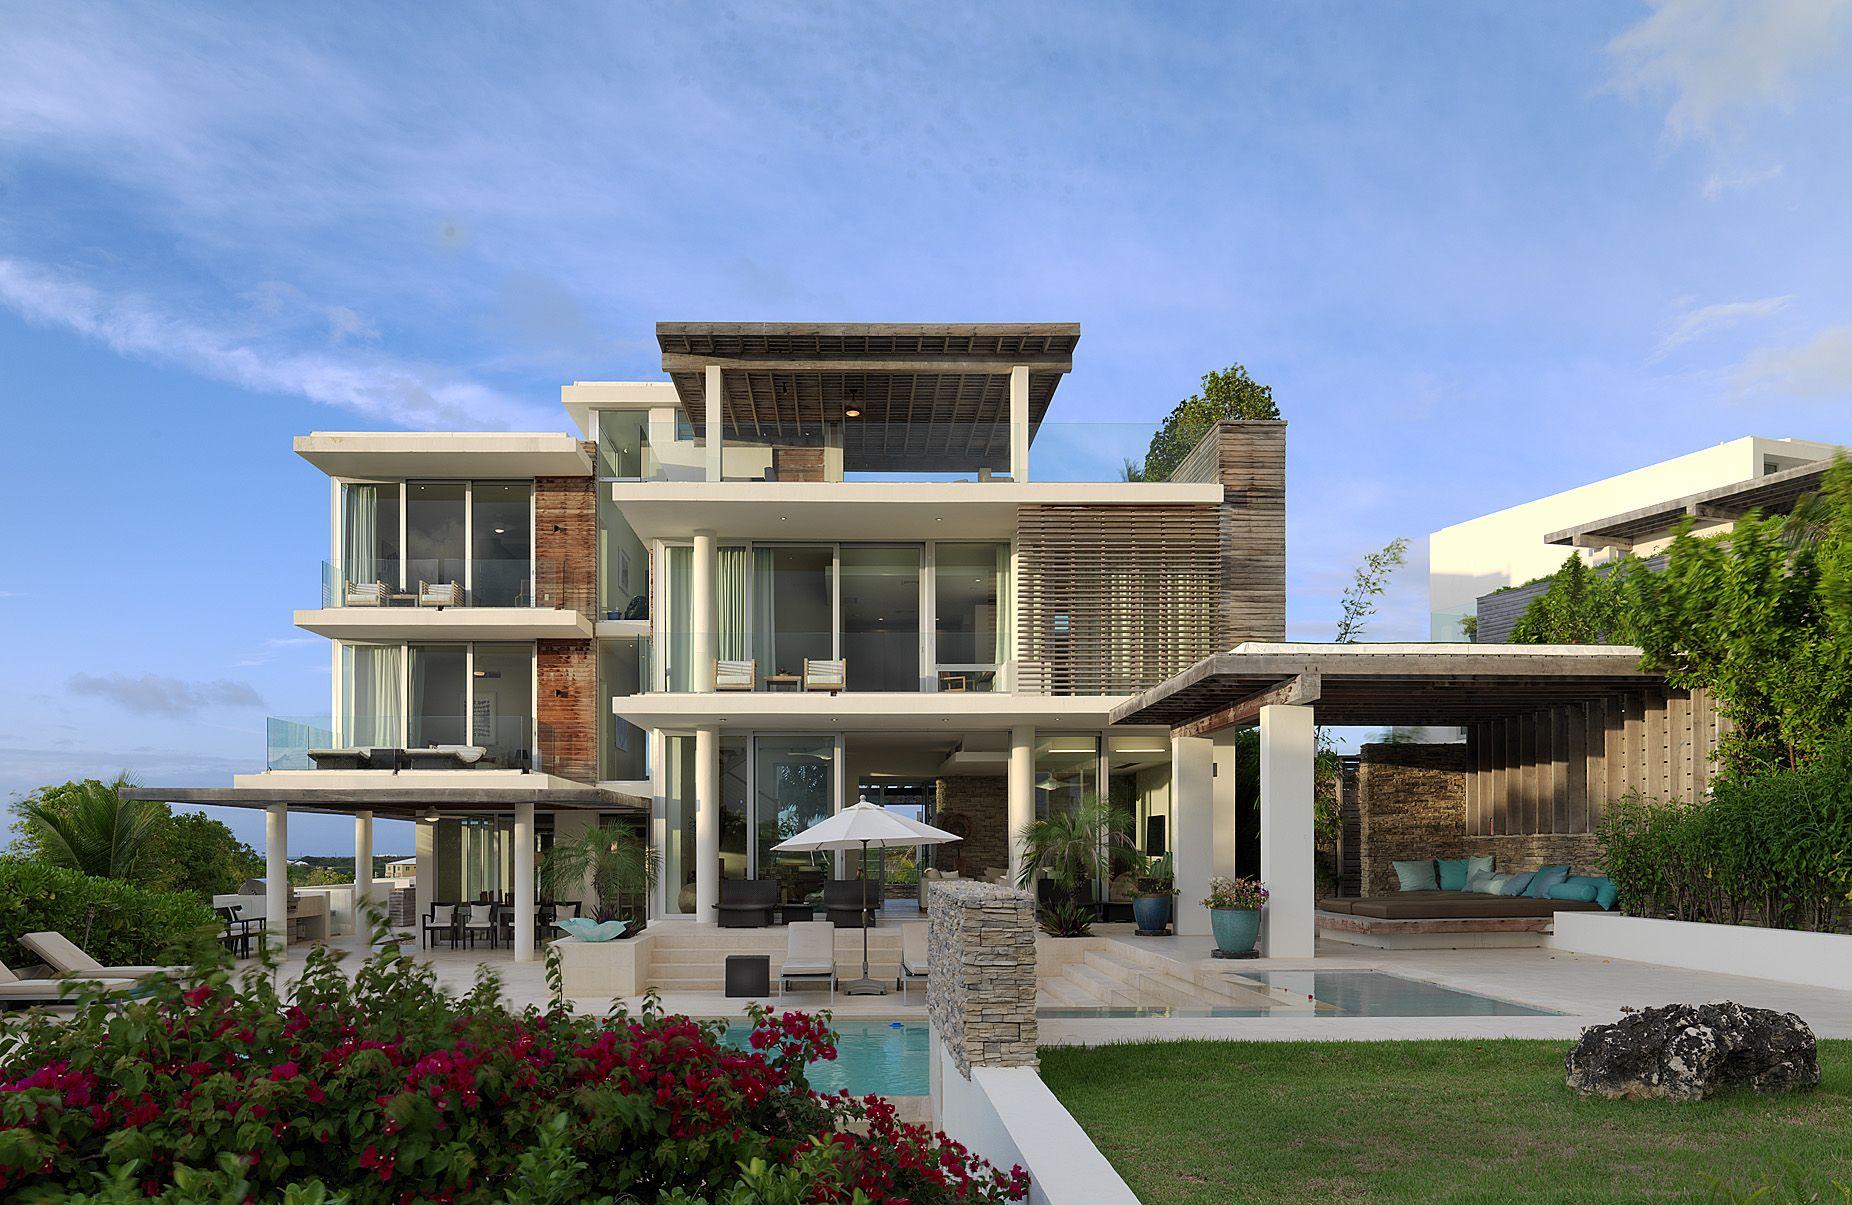 2 Modern Caribbean Seaside House Windows 1852x1205